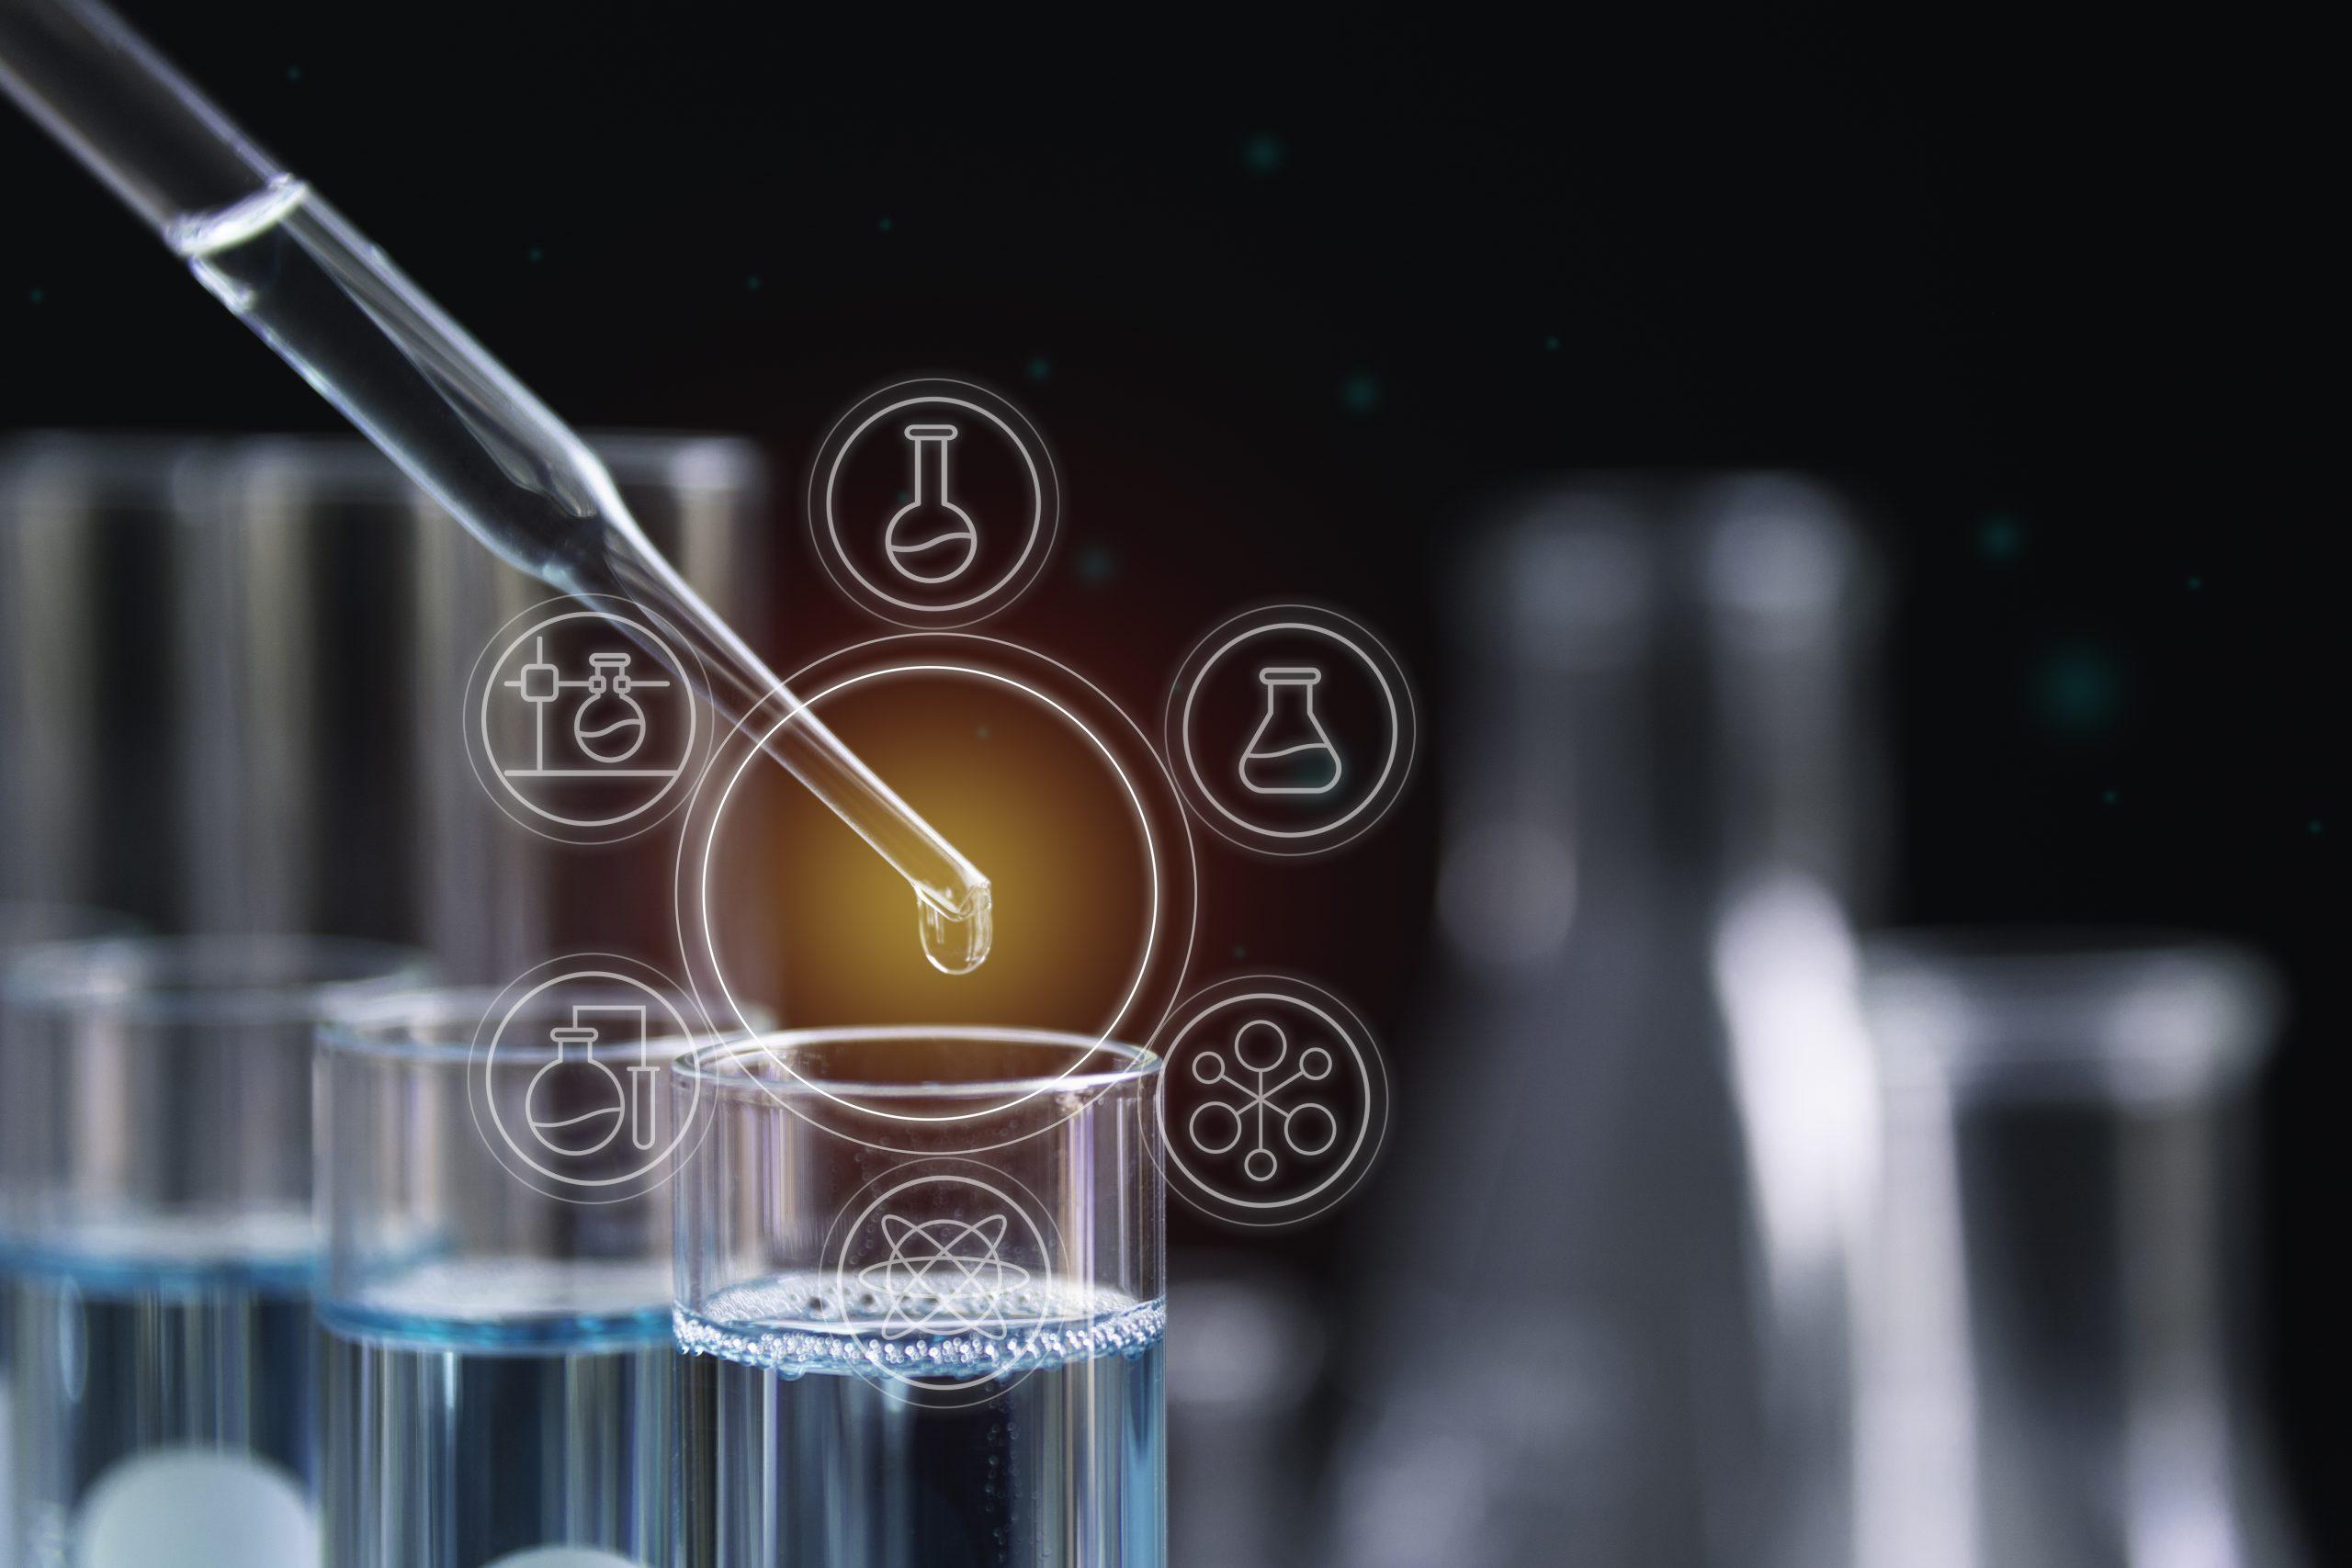 How zero-trust model can help pharma companies mitigate compliance issues